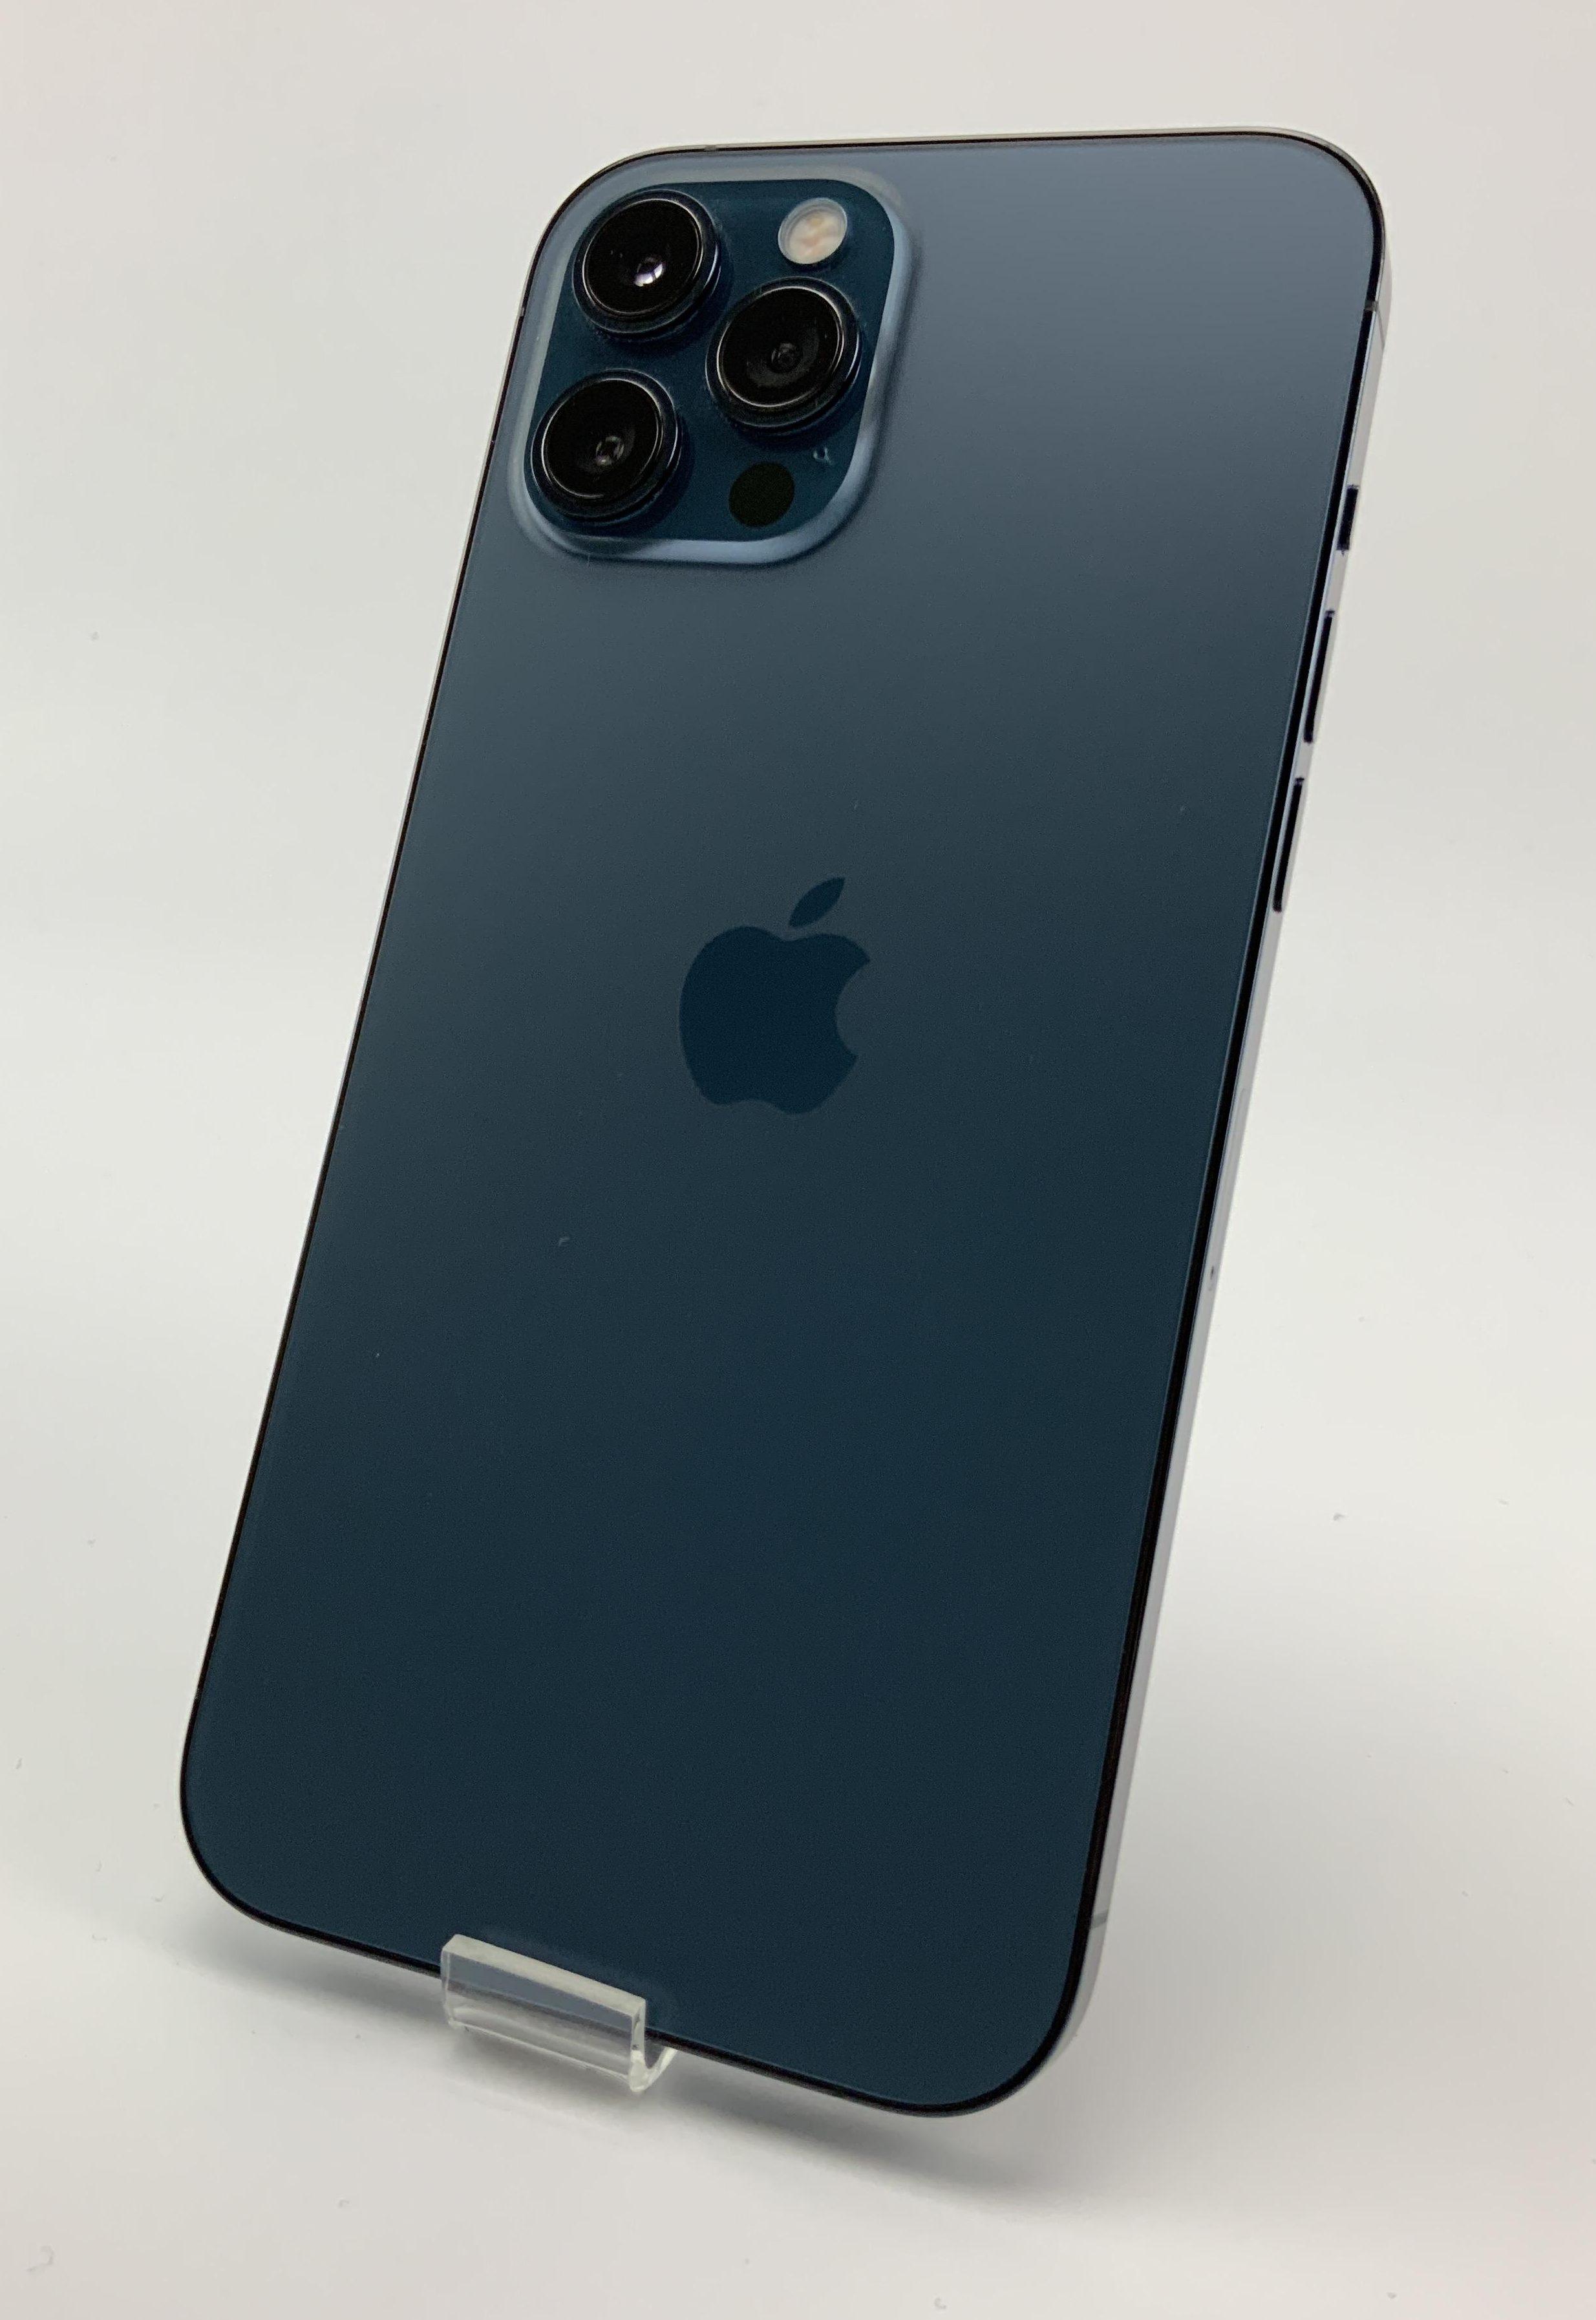 iPhone 12 Pro Max 128GB, 128GB, Pacific Blue, Bild 2